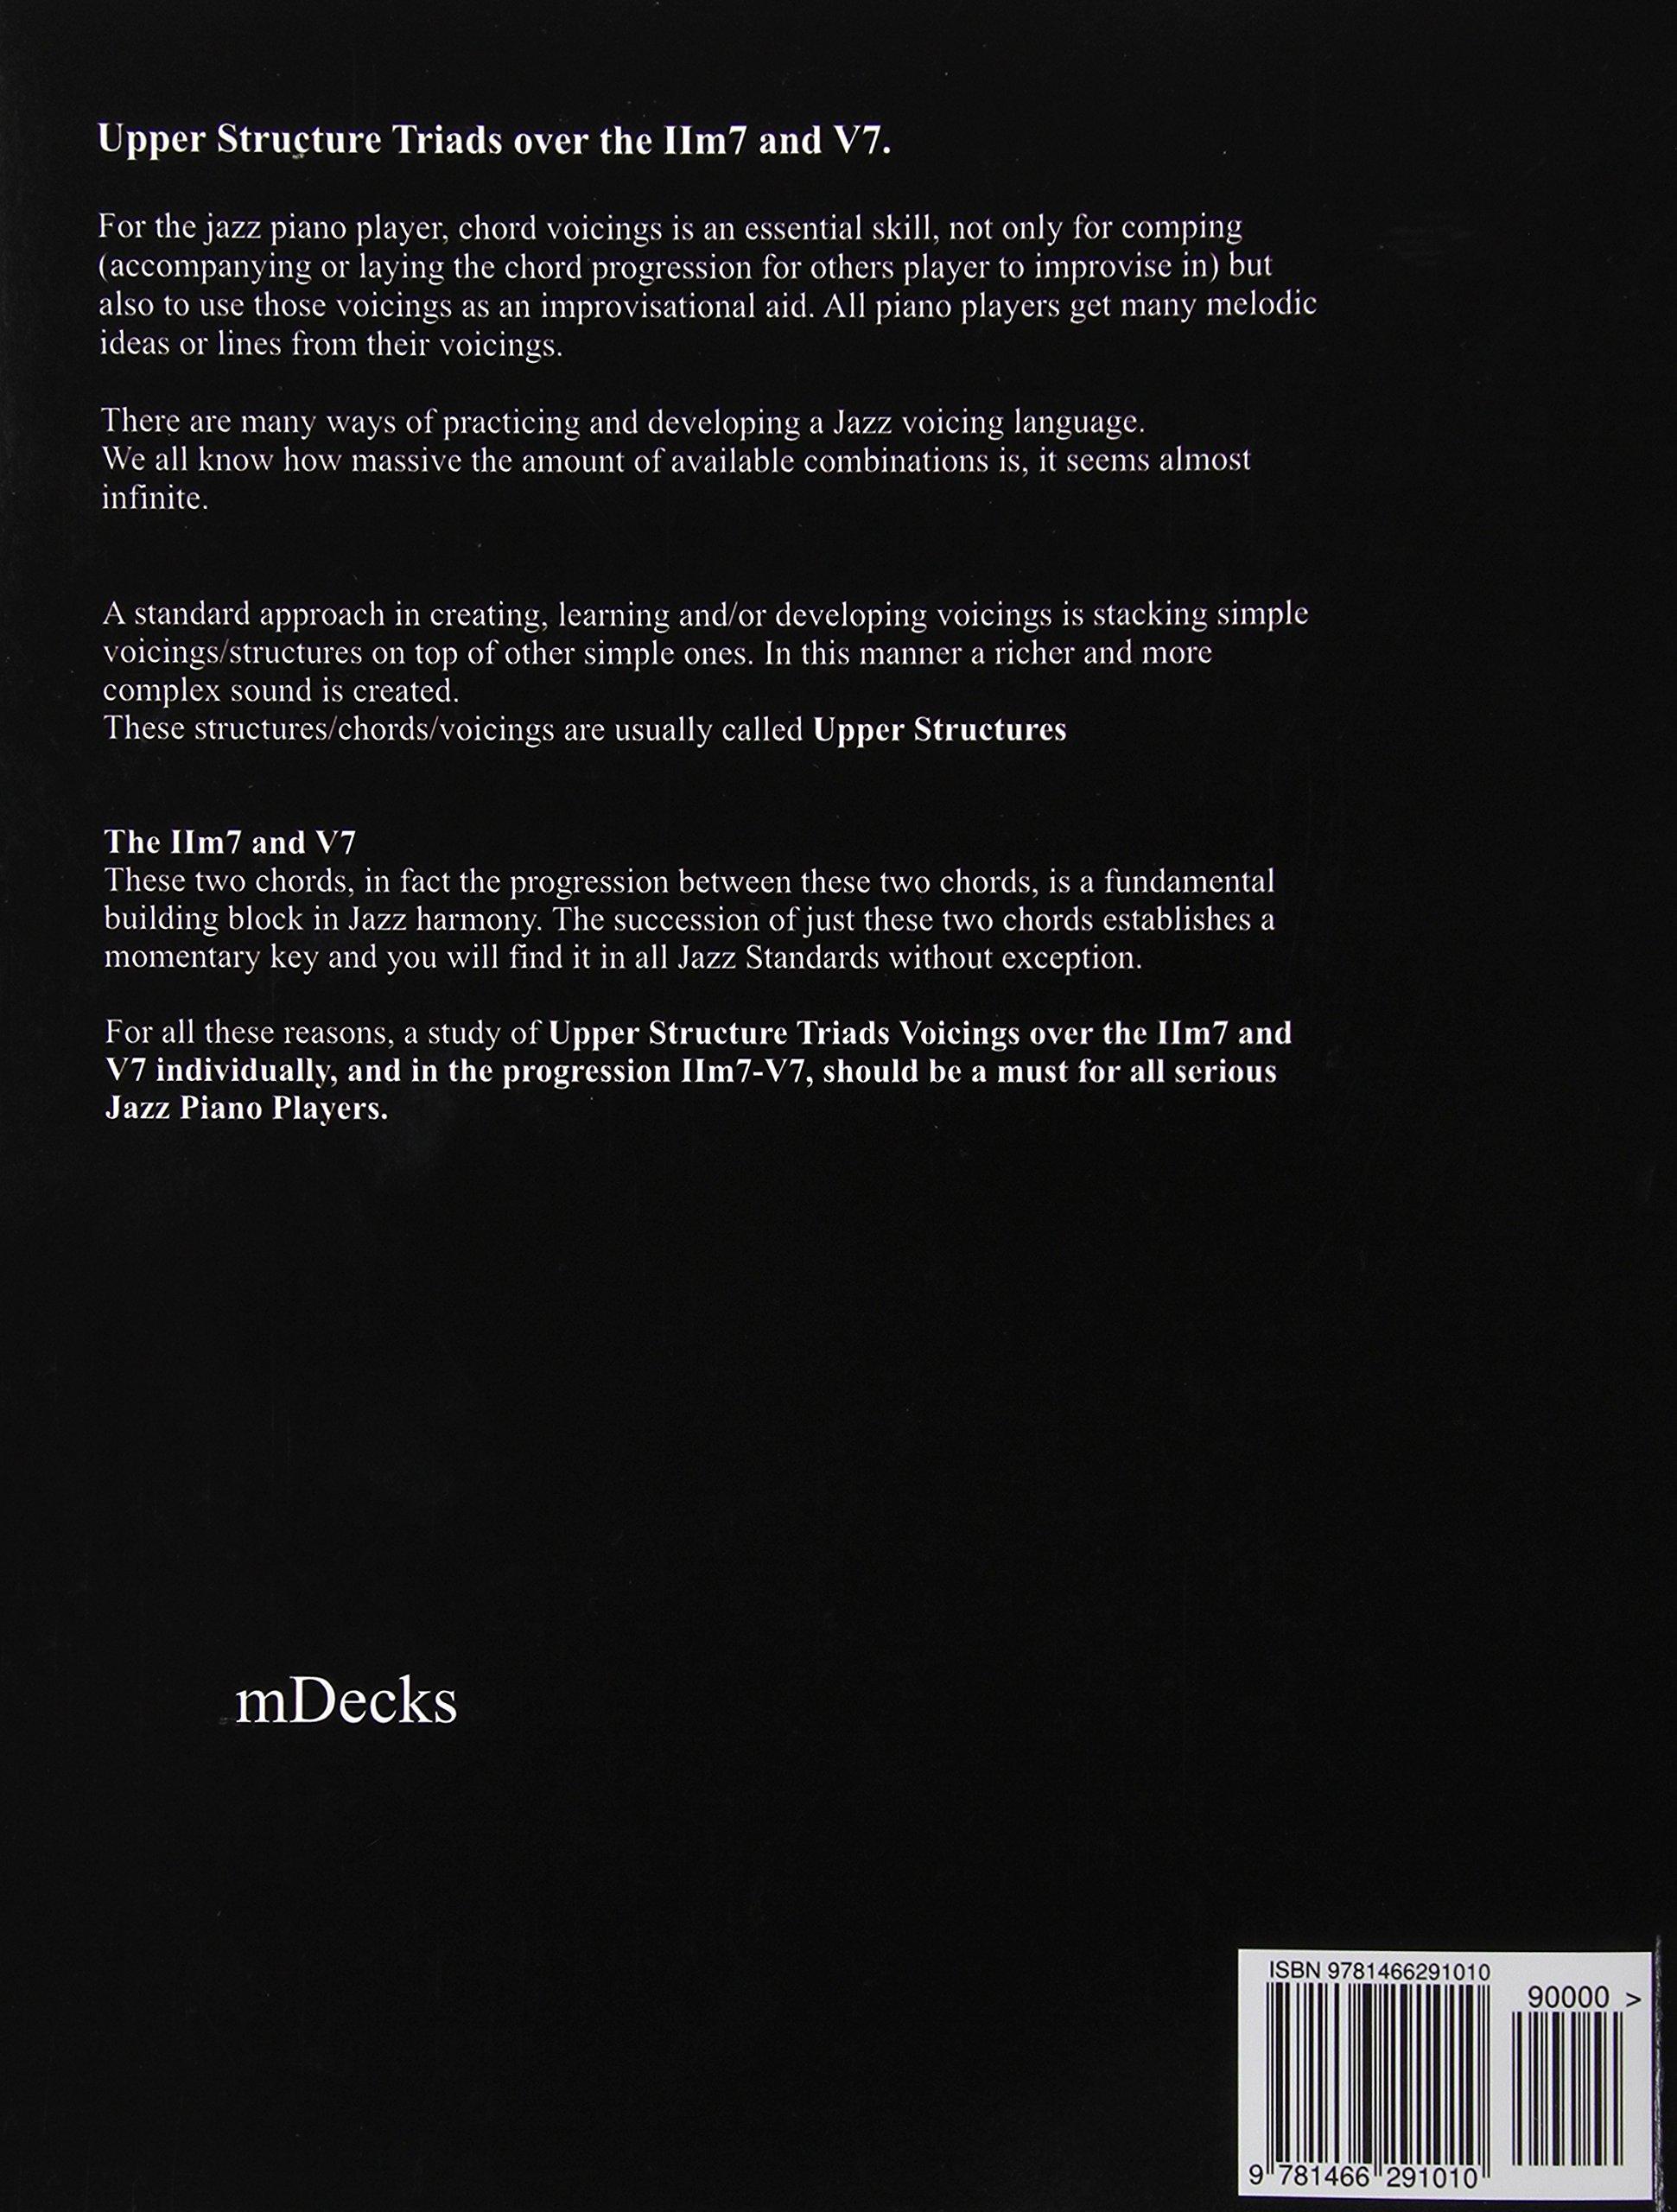 Ust jazz piano chord voicings vol 1 individual upper structures ust jazz piano chord voicings vol 1 individual upper structures triads over iim7 and v7 ariel j ramos 9781466291010 amazon books hexwebz Images